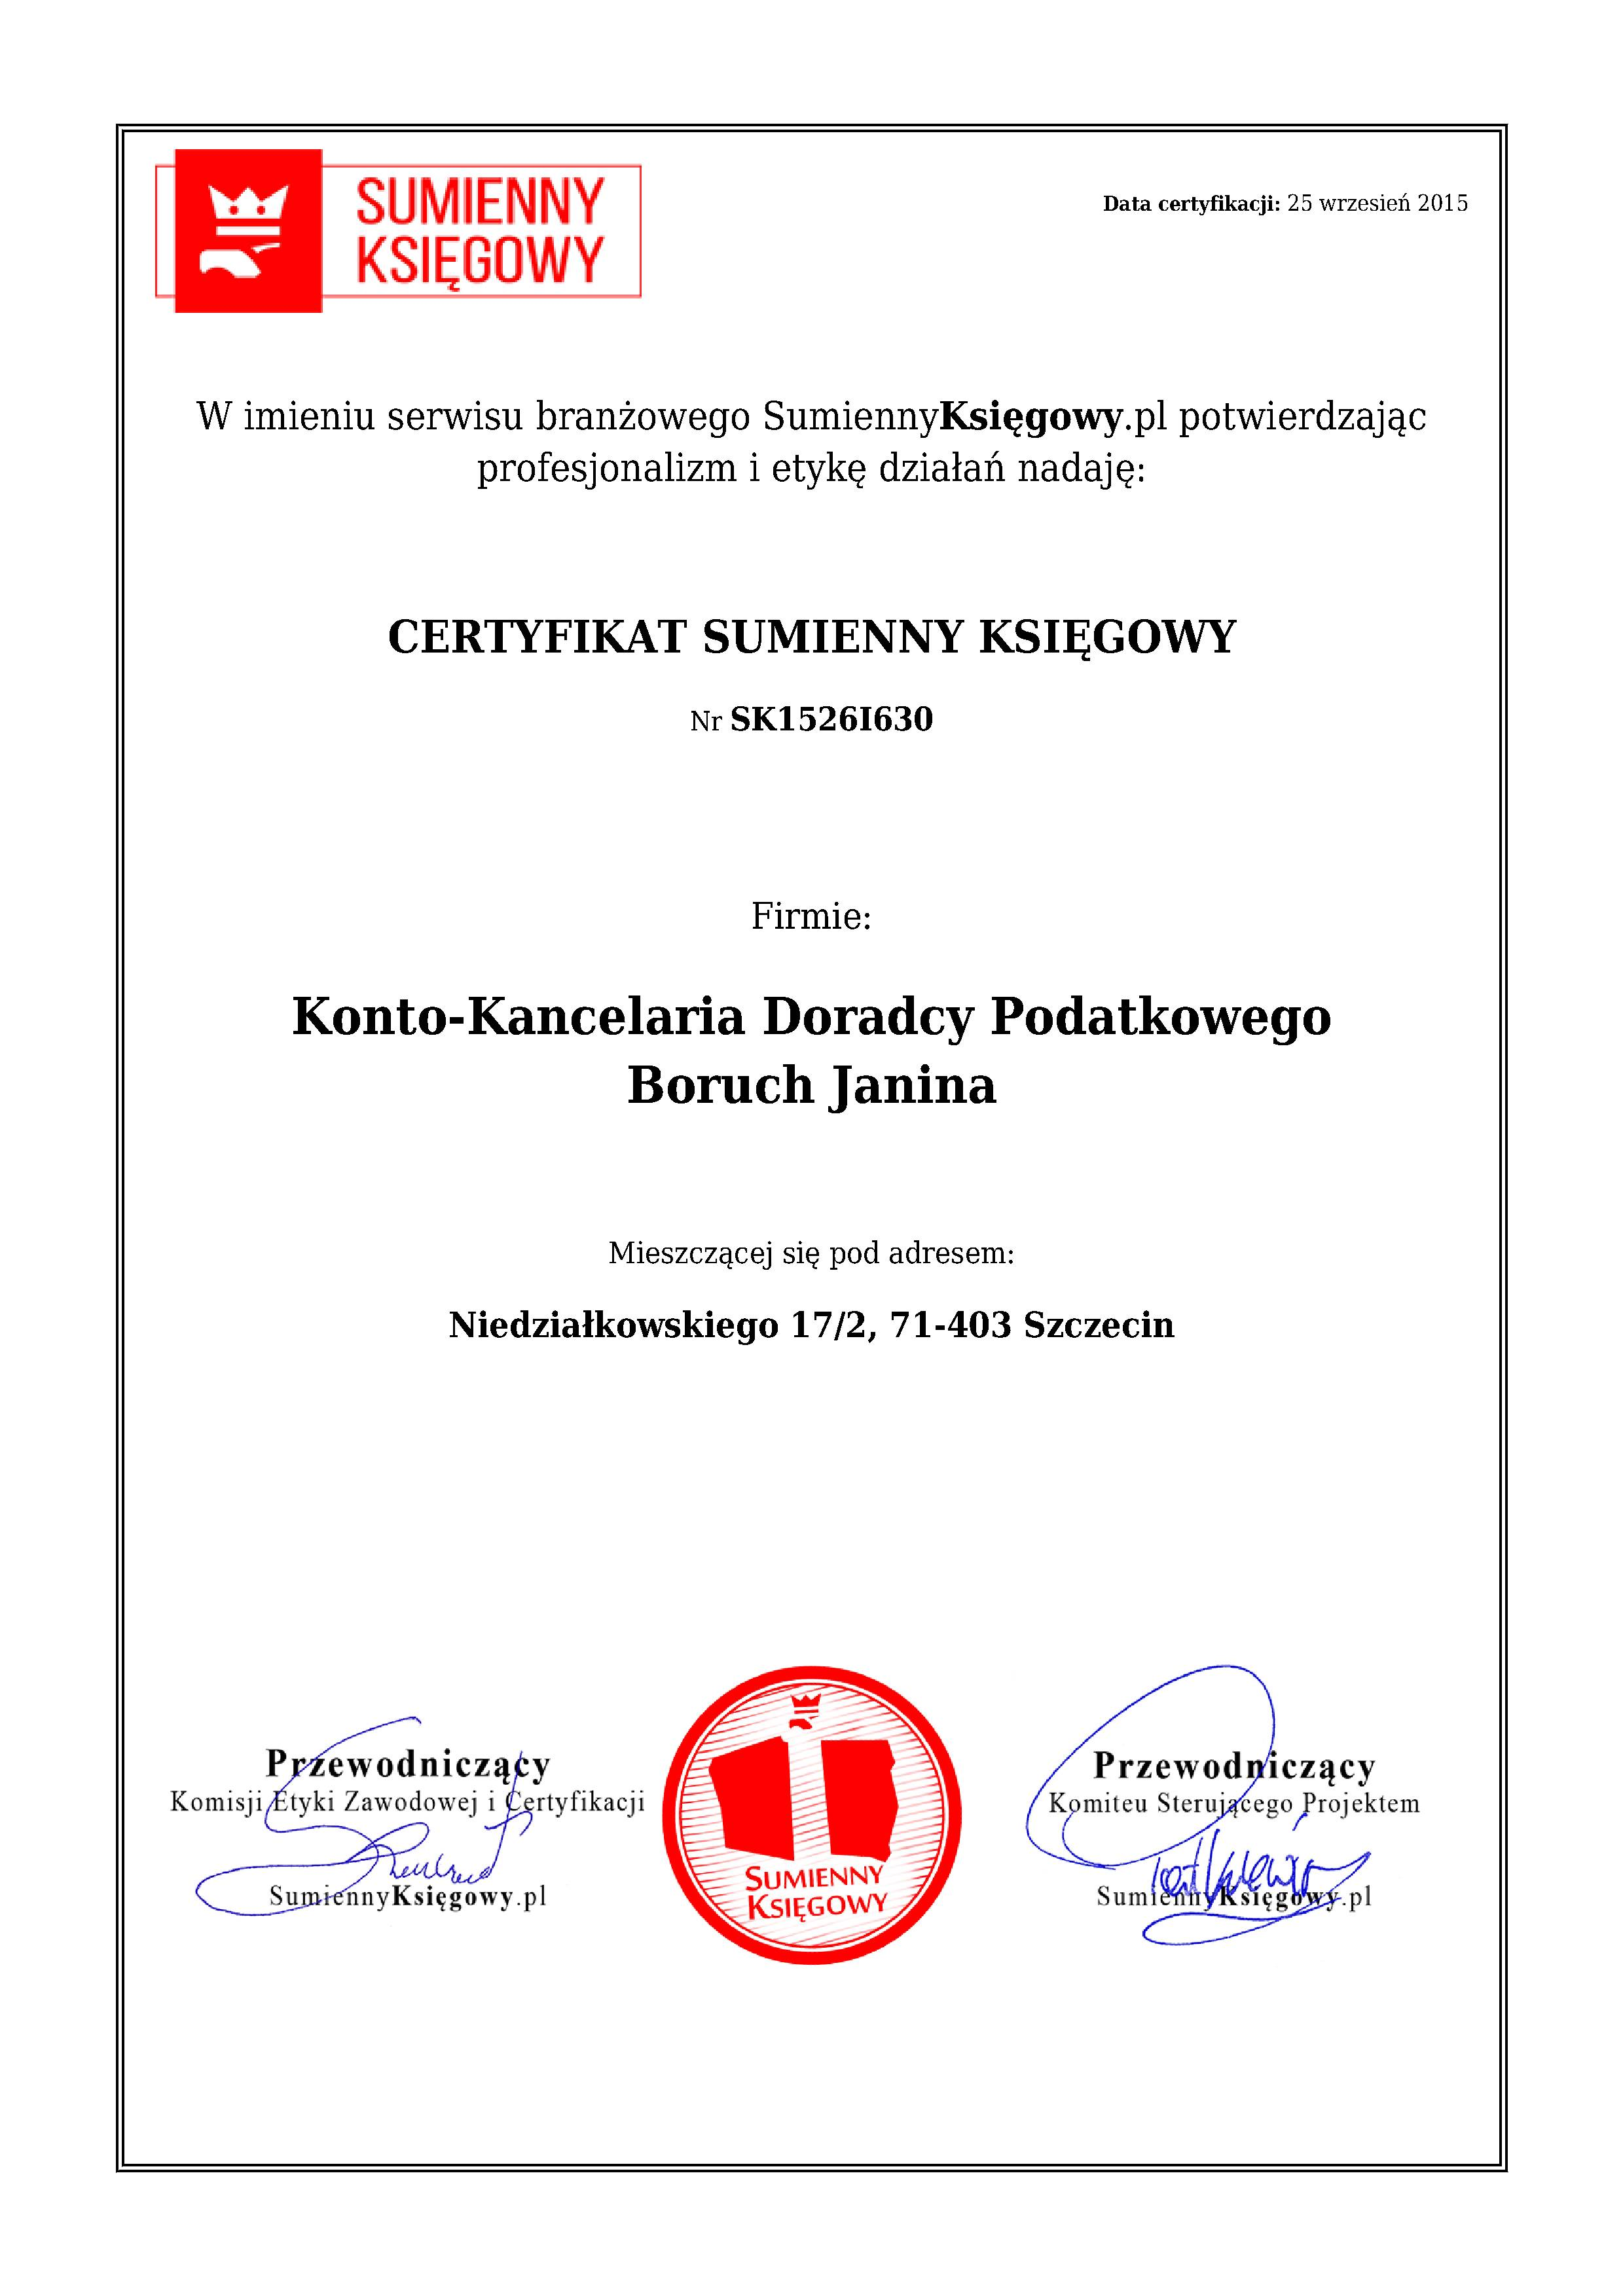 Certyfikat Konto-Kancelaria Doradcy Podatkowego Boruch Janina